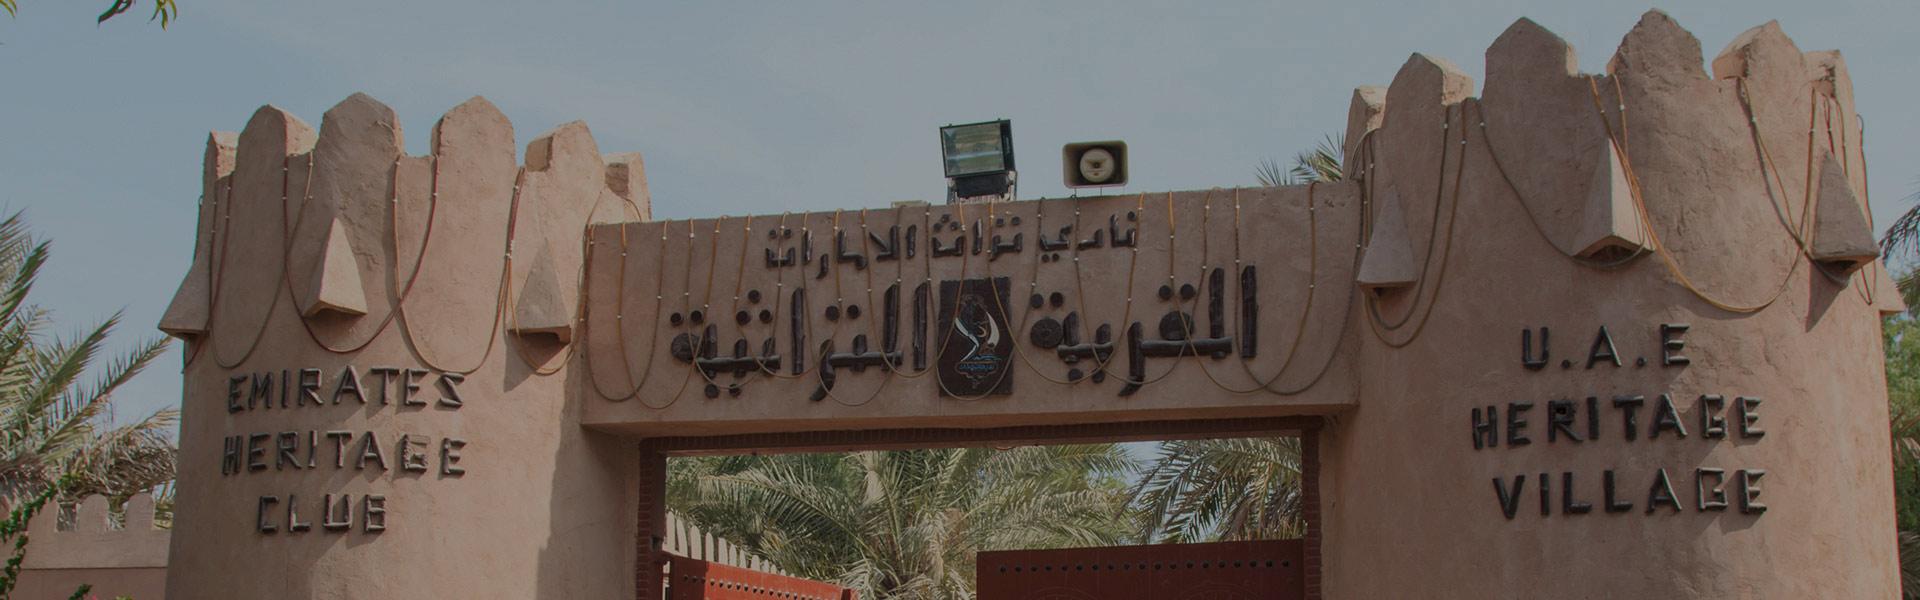 Heritage Village in Abu Dhabi